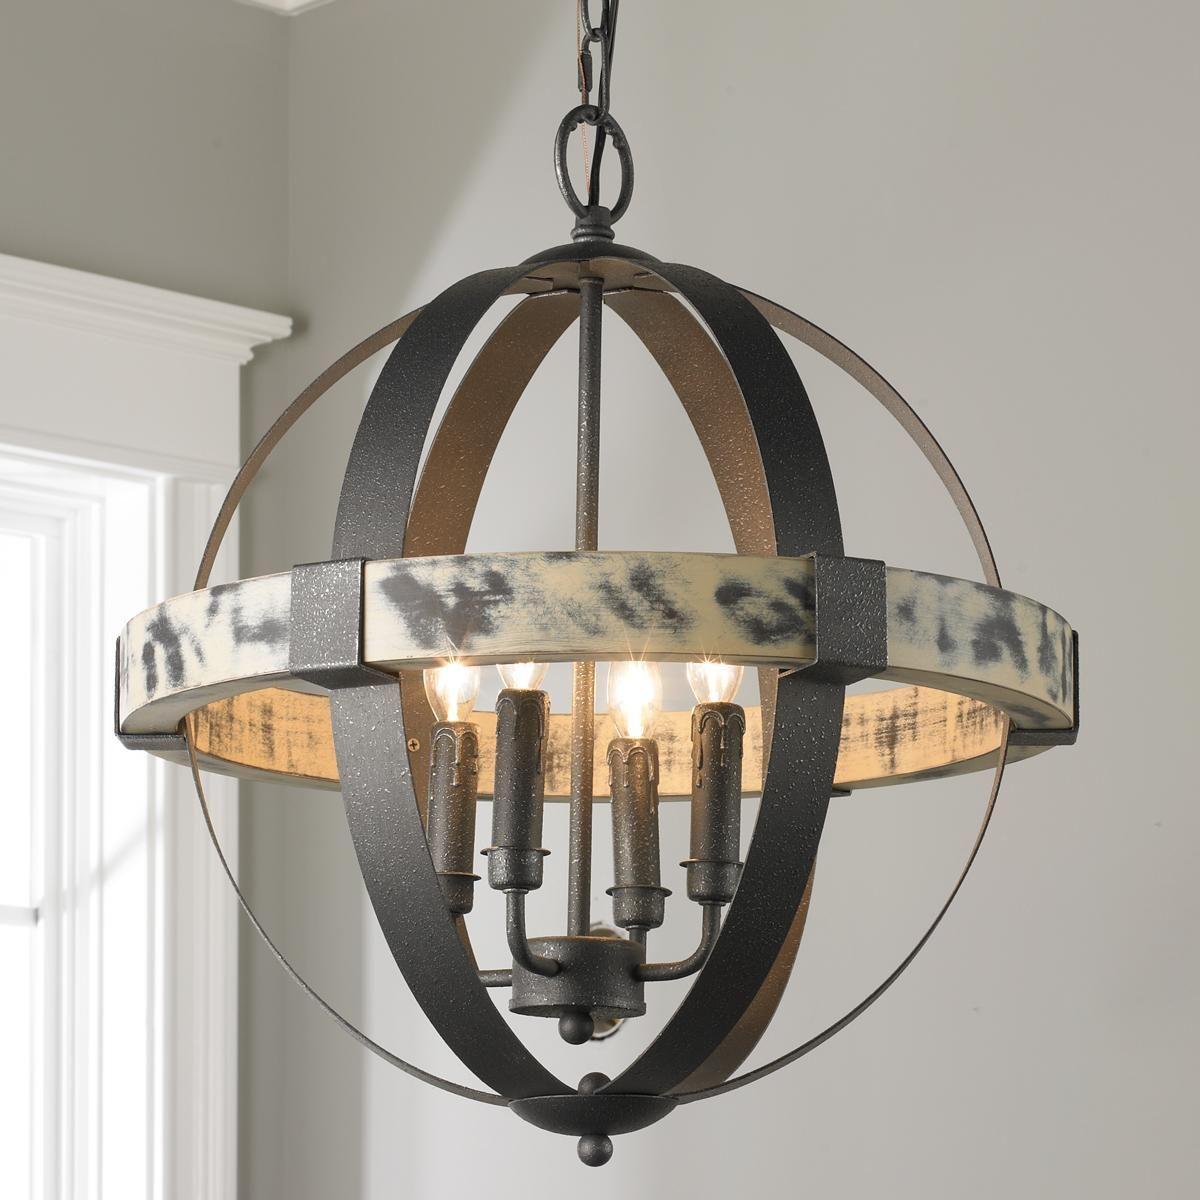 Aspen wrought iron globe chandelier small wrought iron aspen aspen wrought iron globe chandelier small arubaitofo Image collections